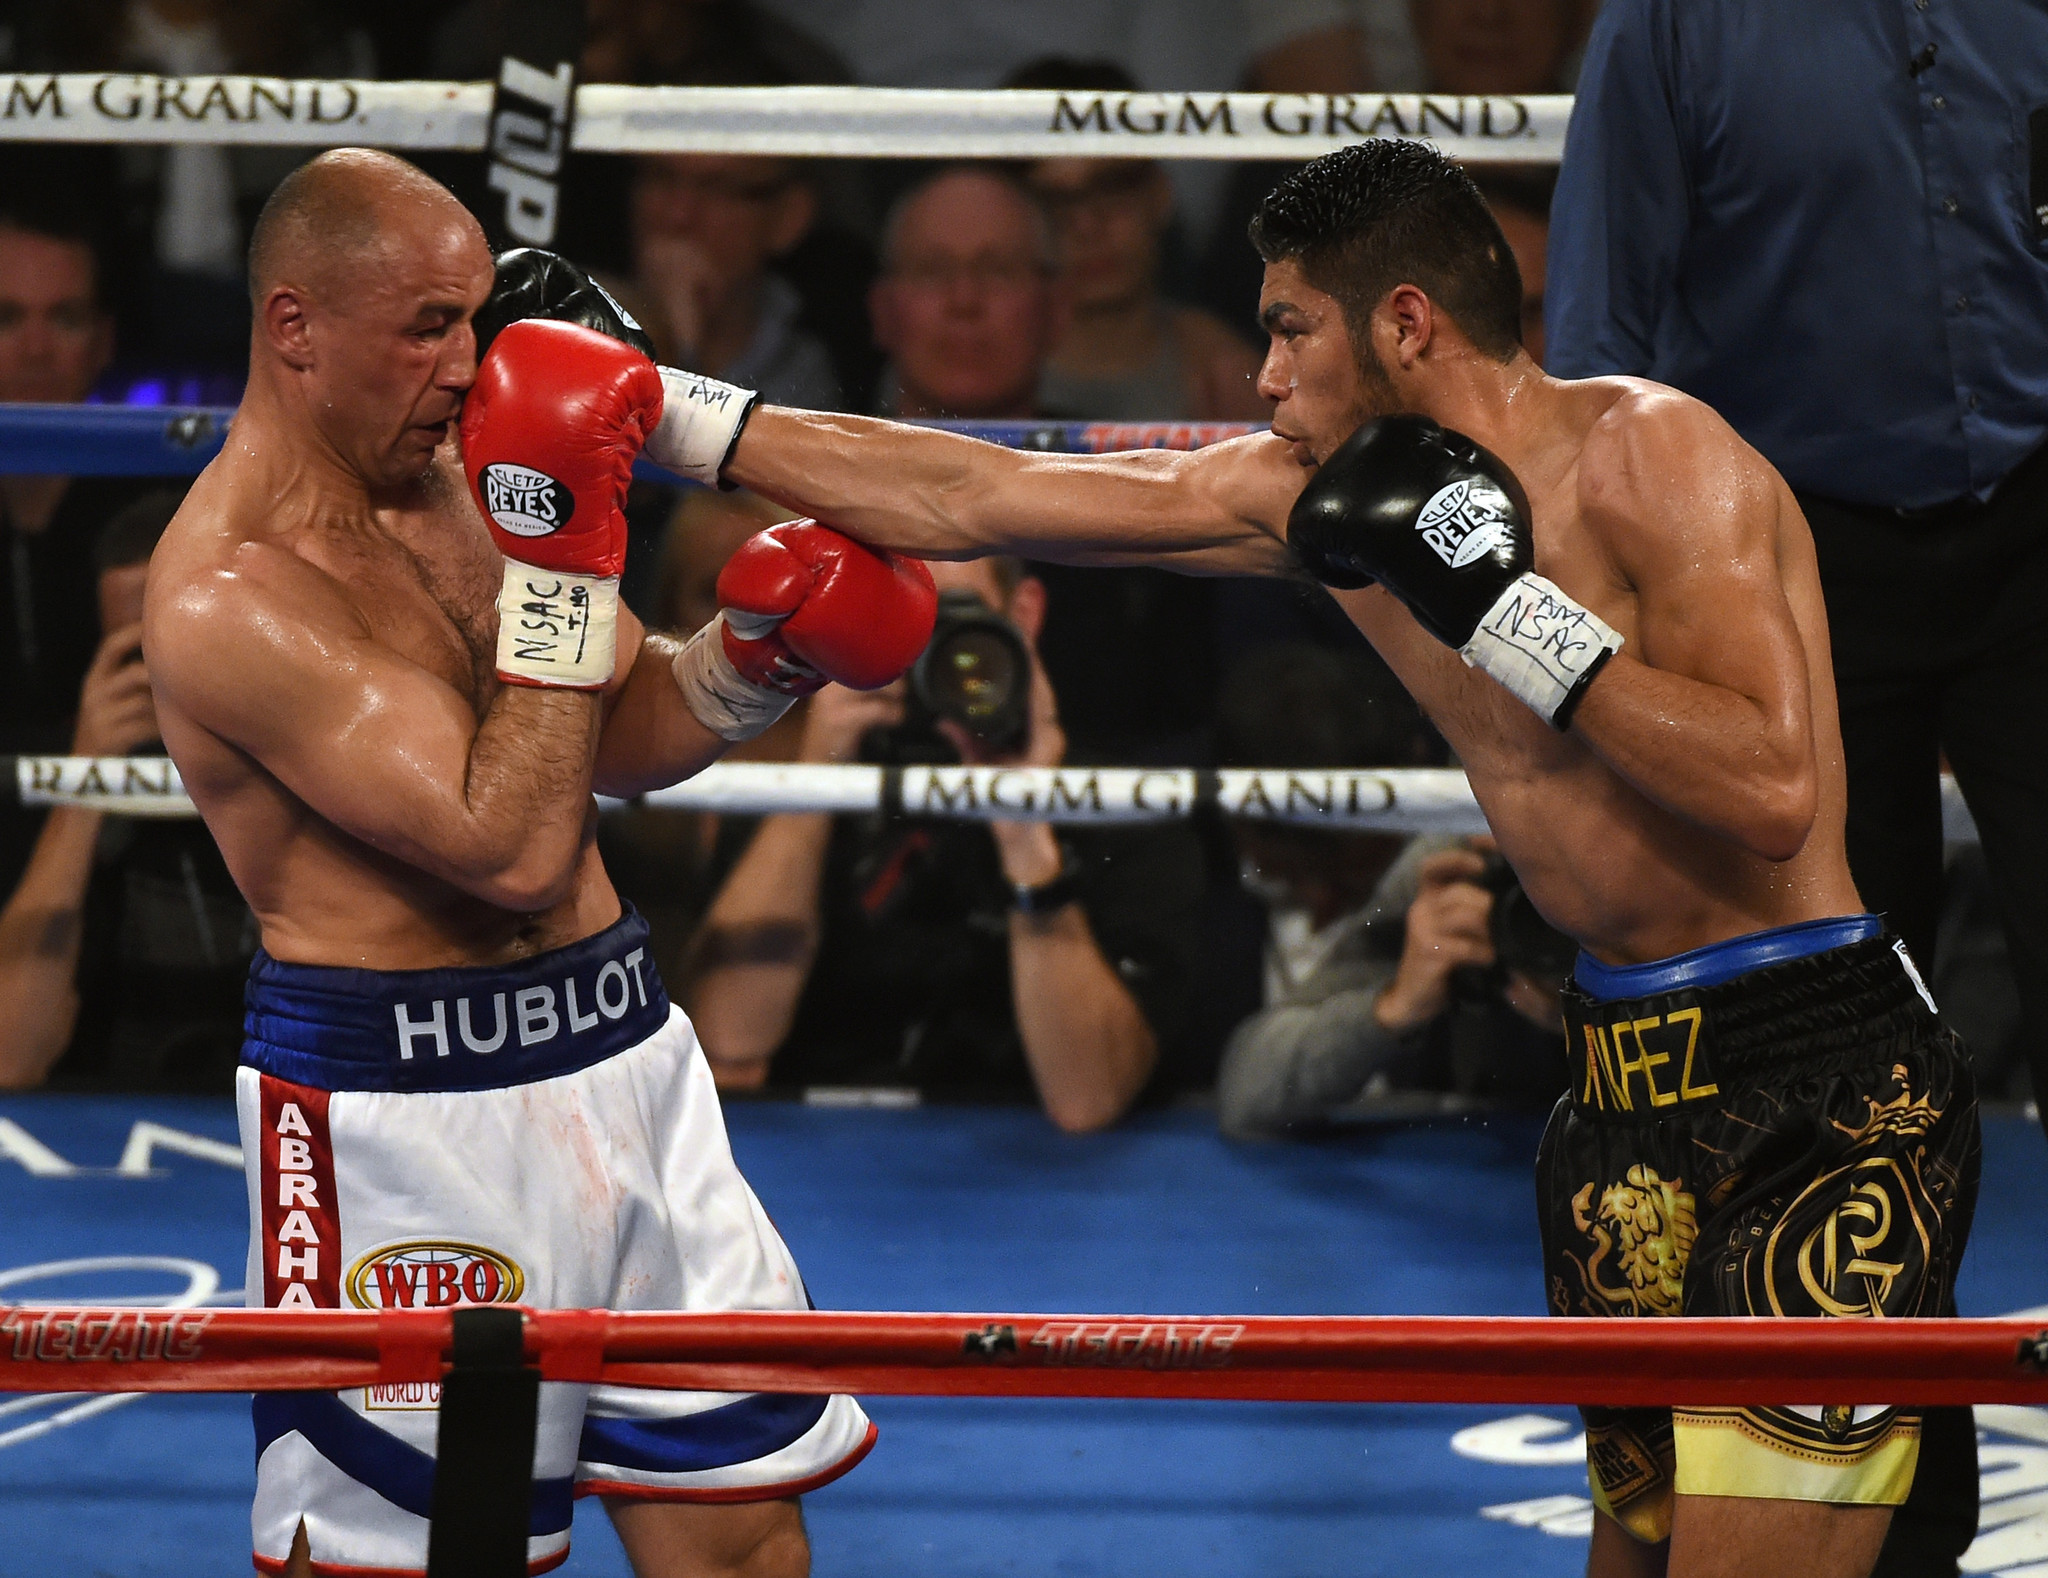 La-sp-sn-boxing-gennady-golovkin-promoter-gilberto-ramirez-canelo-khan-20160411